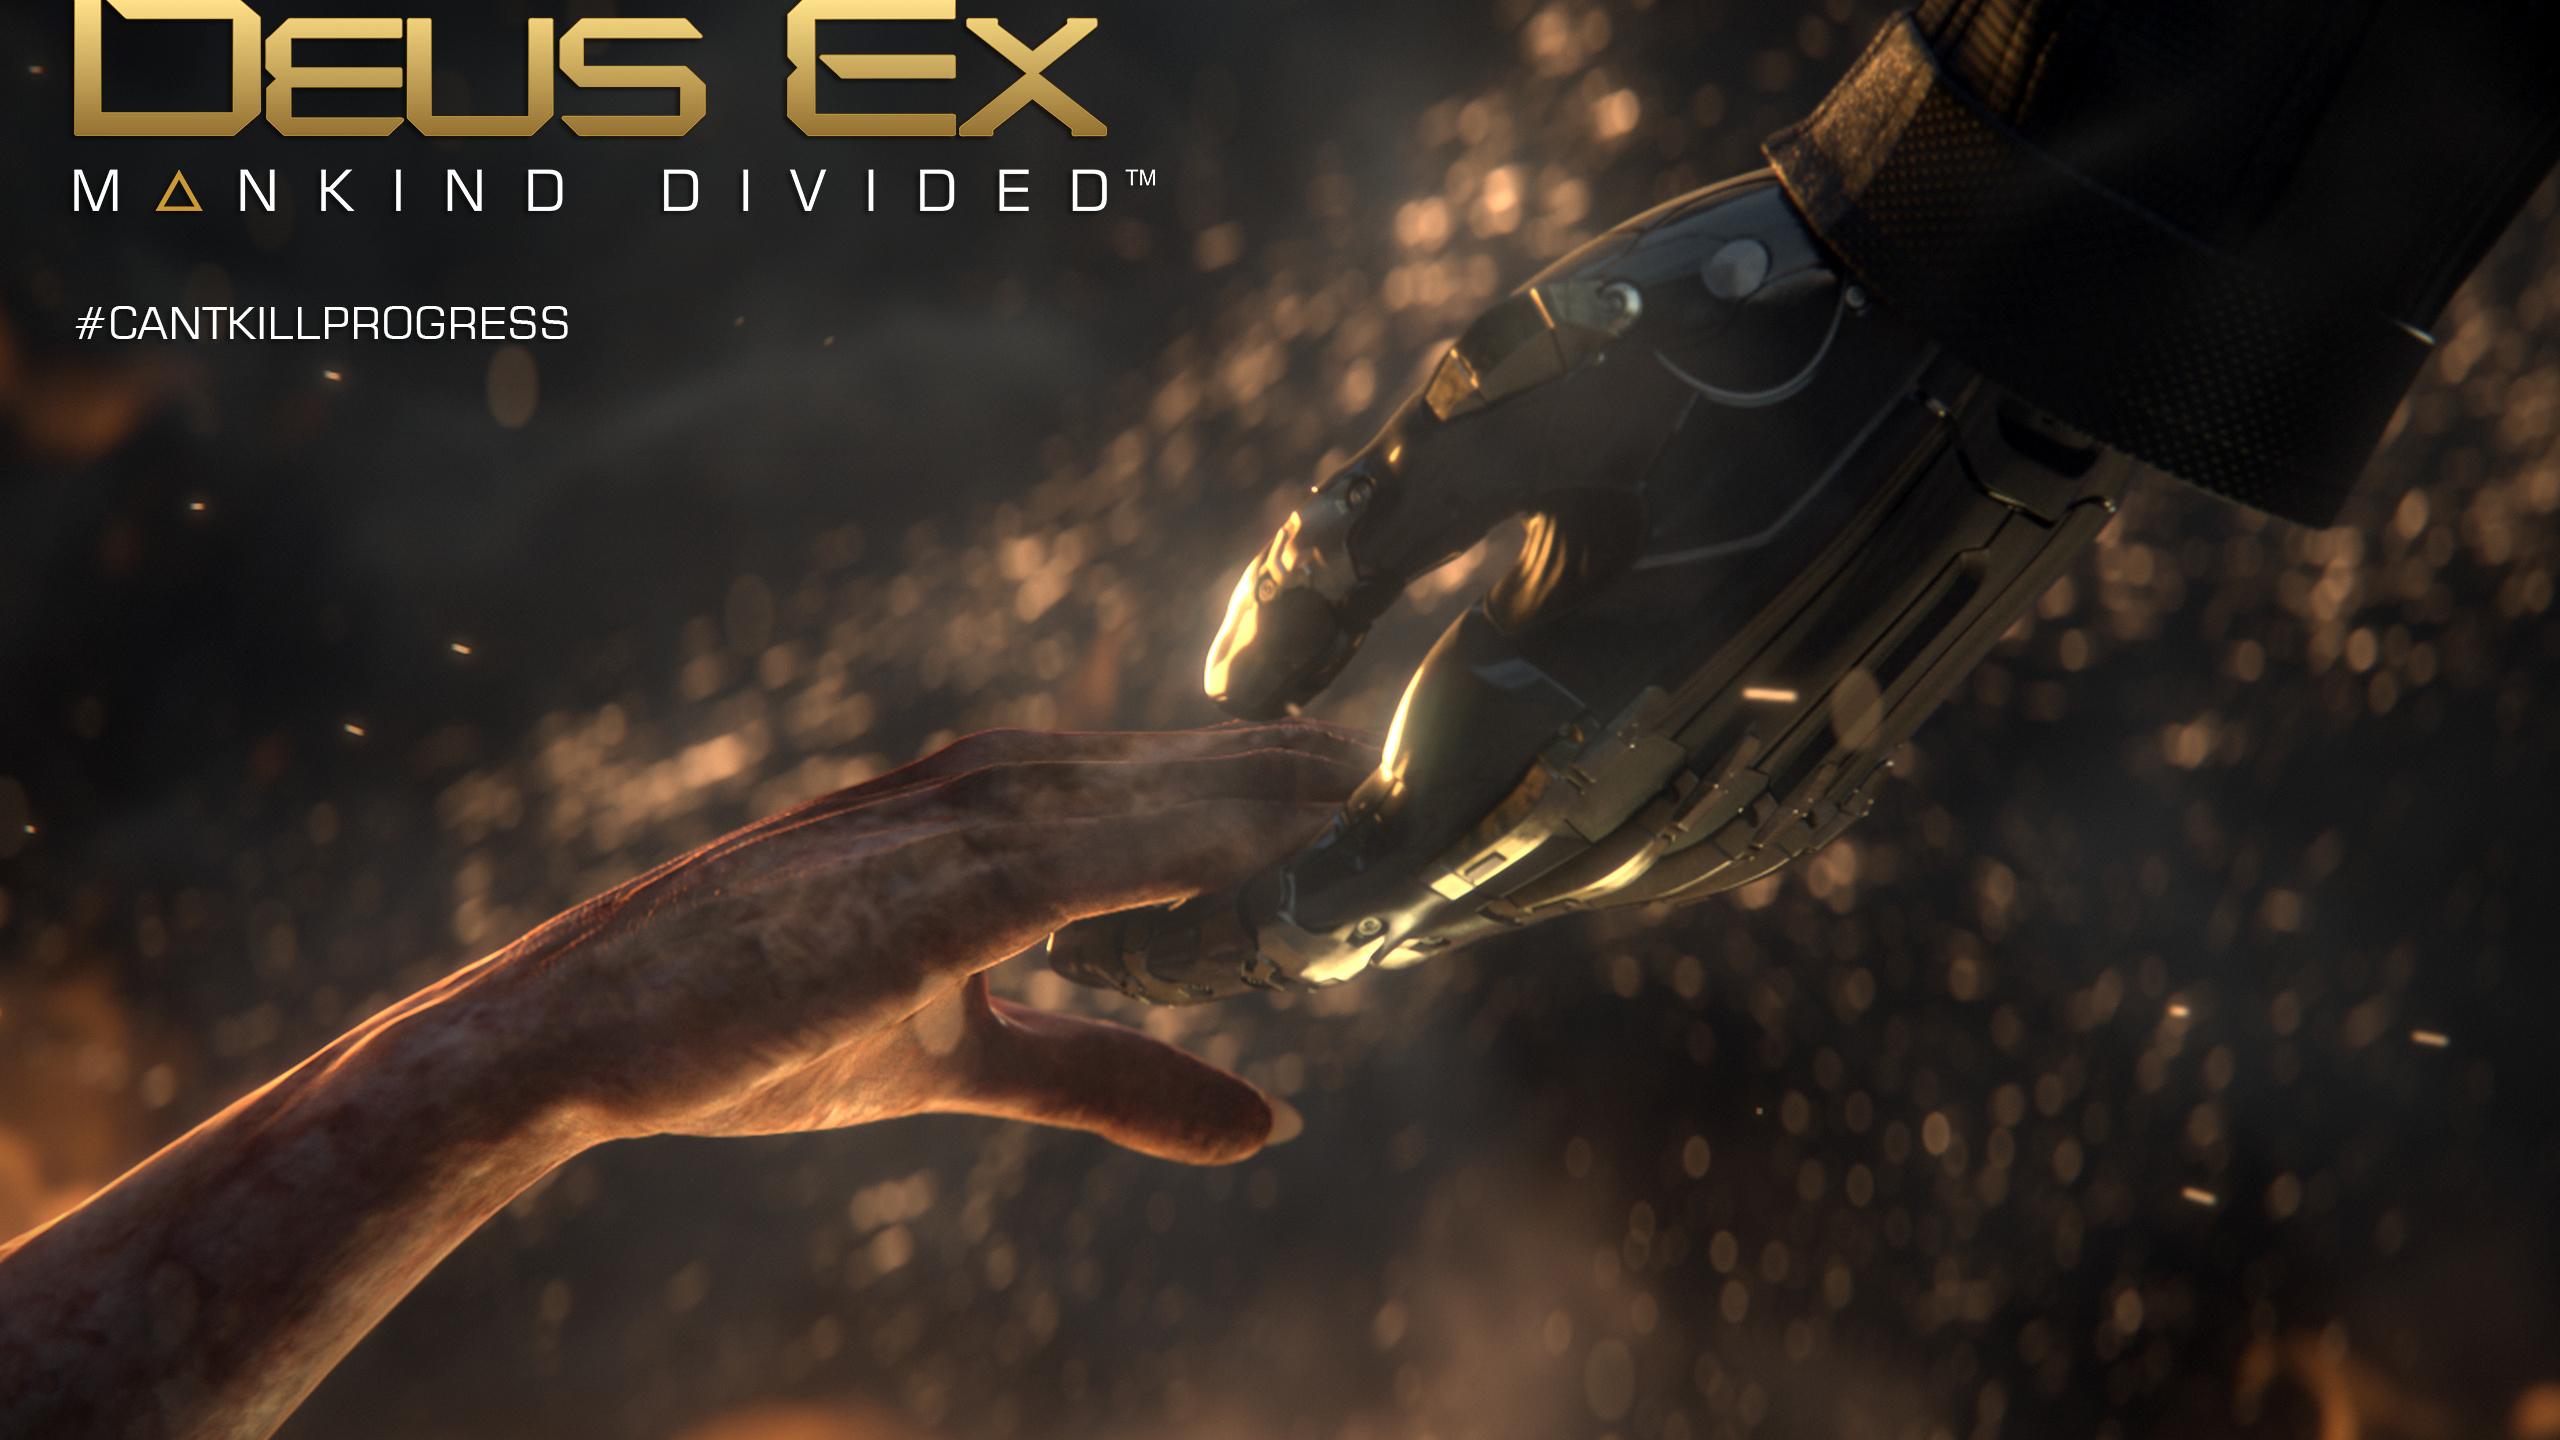 Deus Ex Mankind Divided Wallpaper: 2560x1440 Deus Ex 1440P Resolution HD 4k Wallpapers